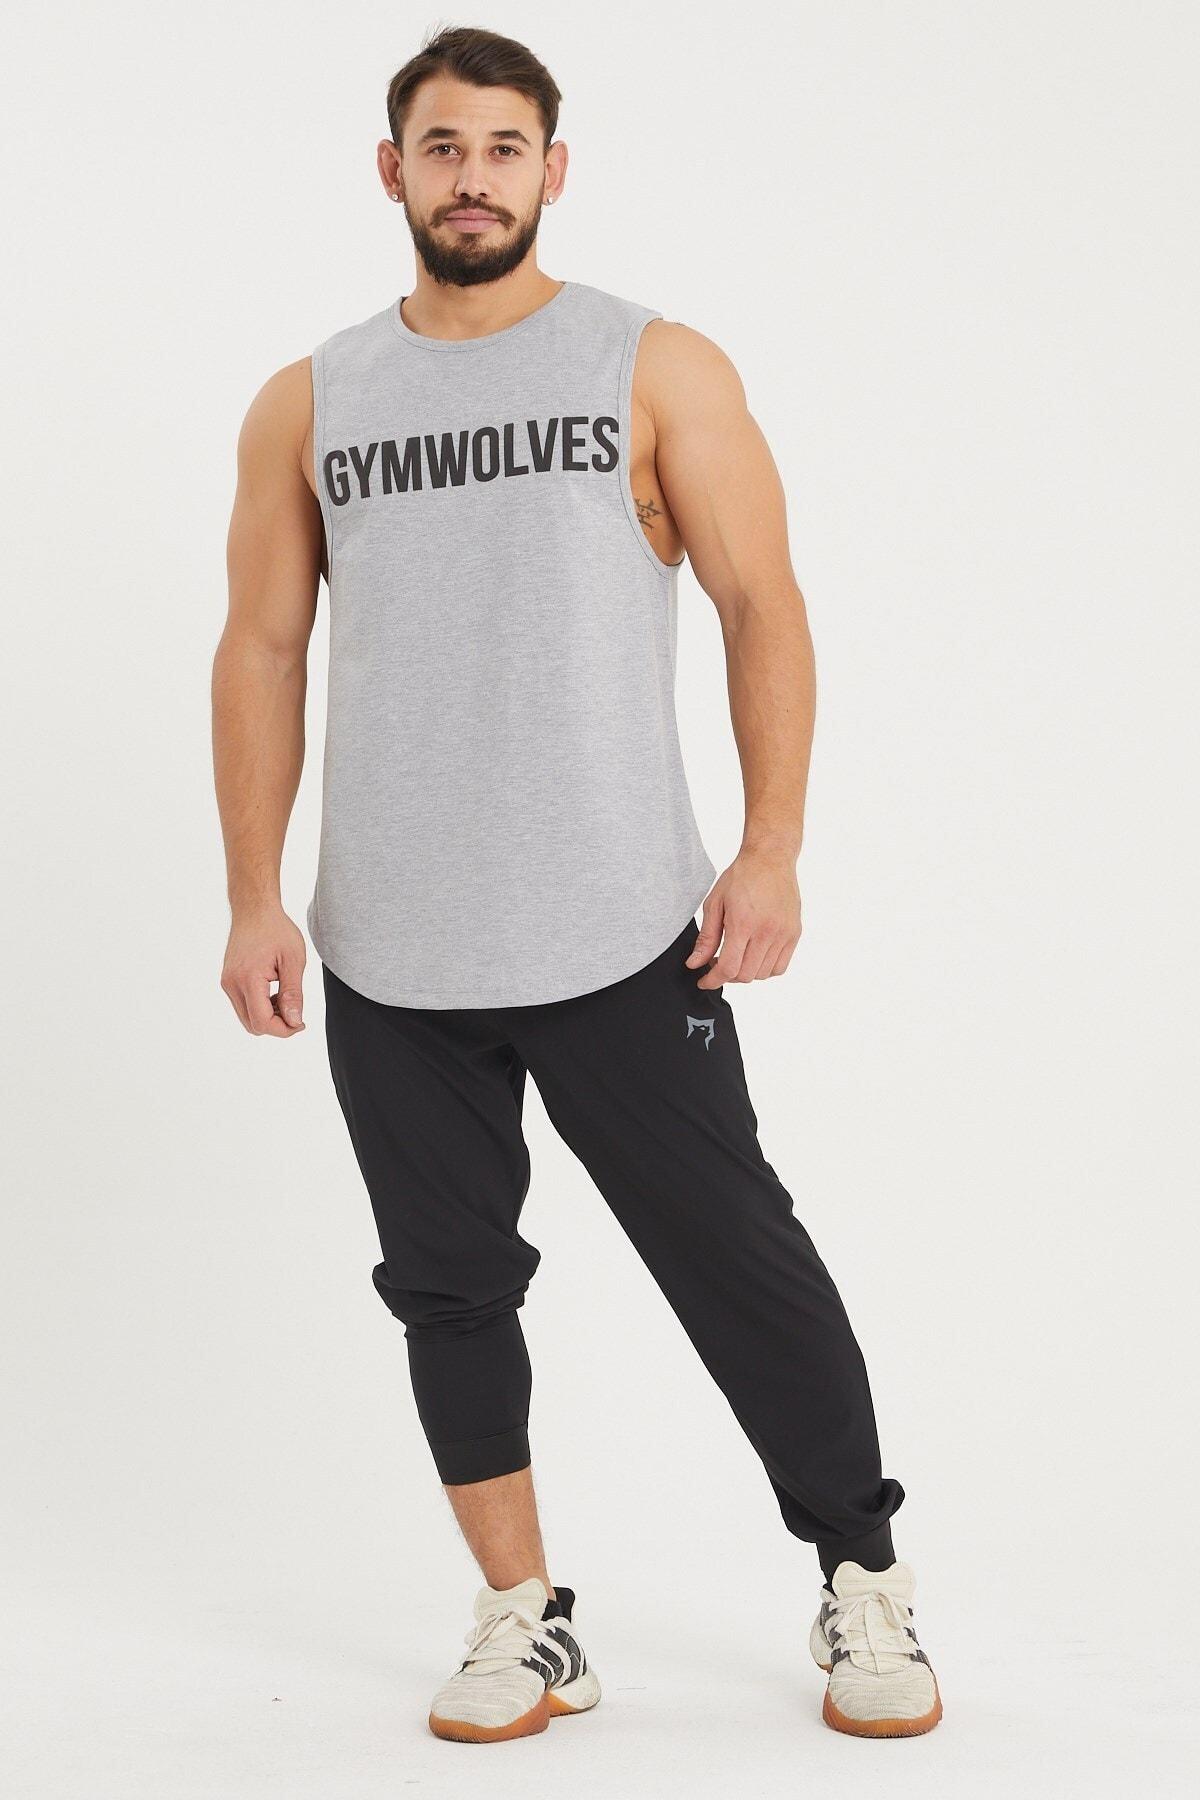 Gymwolves Erkek Kolsuz T-shirt | Gri | Erkek Spor T-shirt | Workout Tanktop | 2